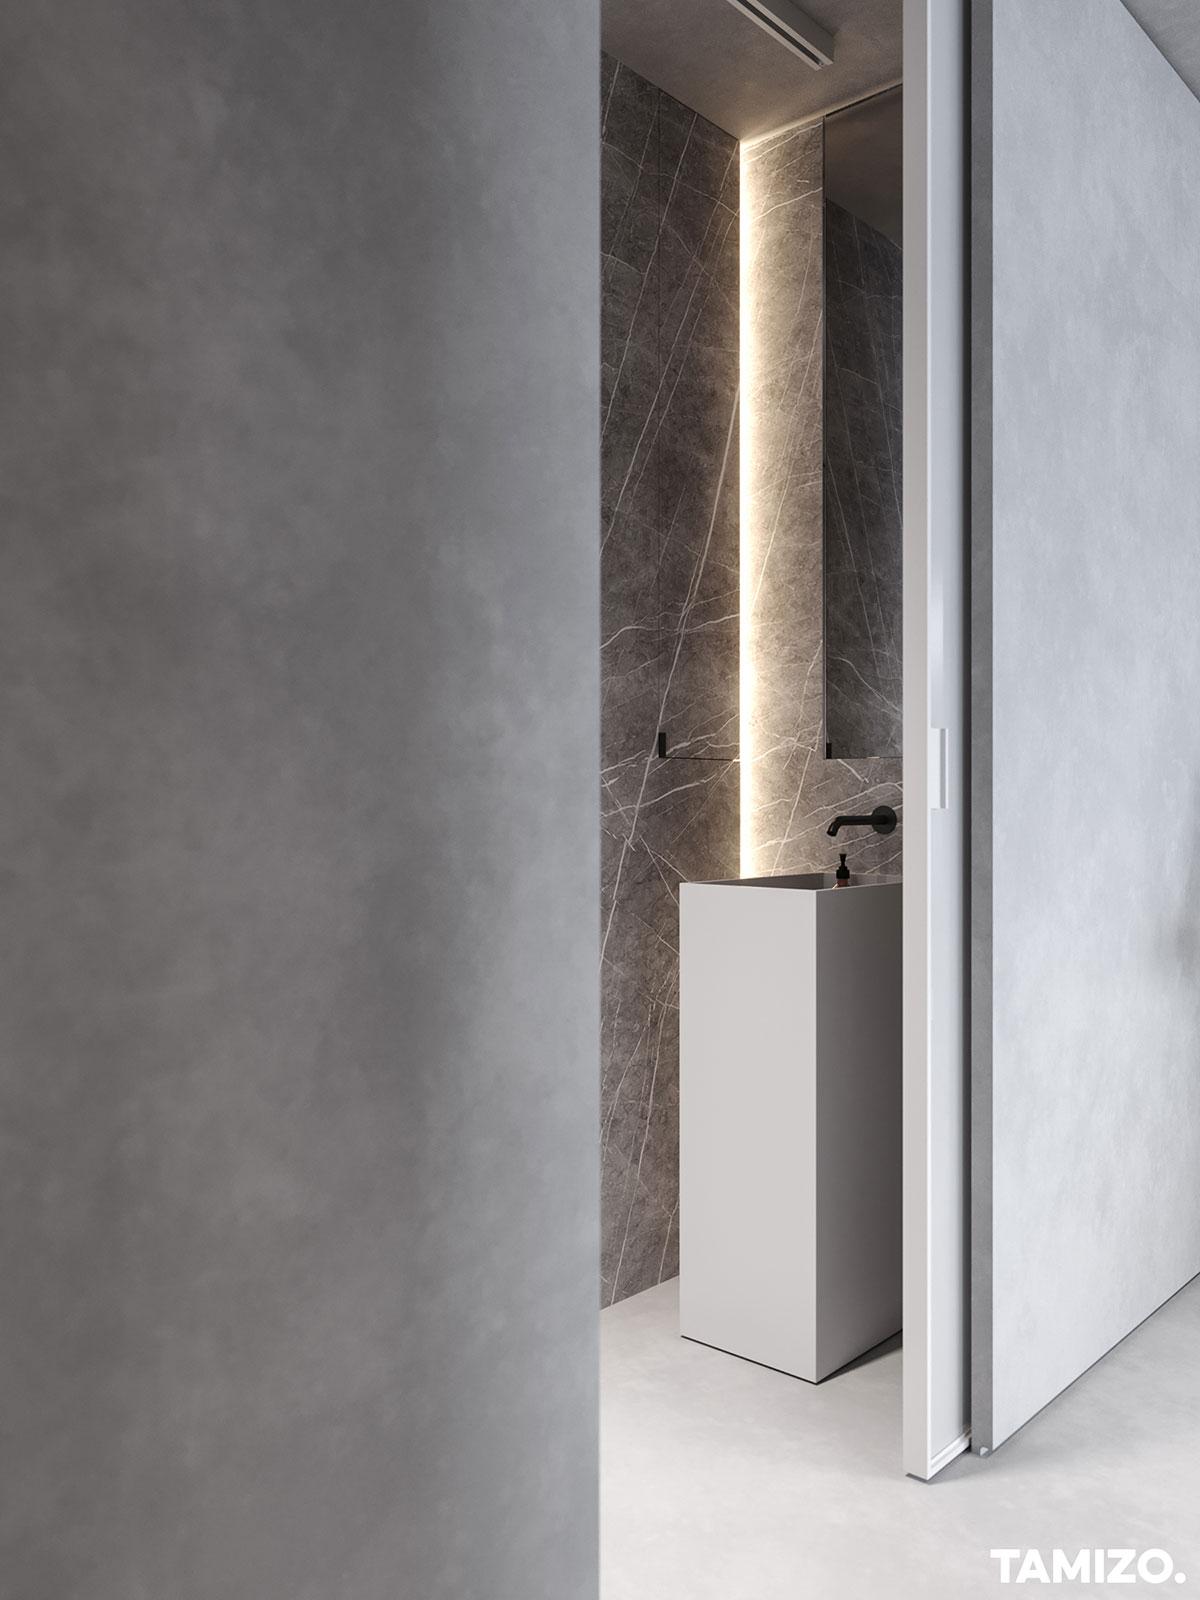 tamizo_architects_mateusz_kuo_stolarski_nice_nicea_france_iterior_design_apartment_10